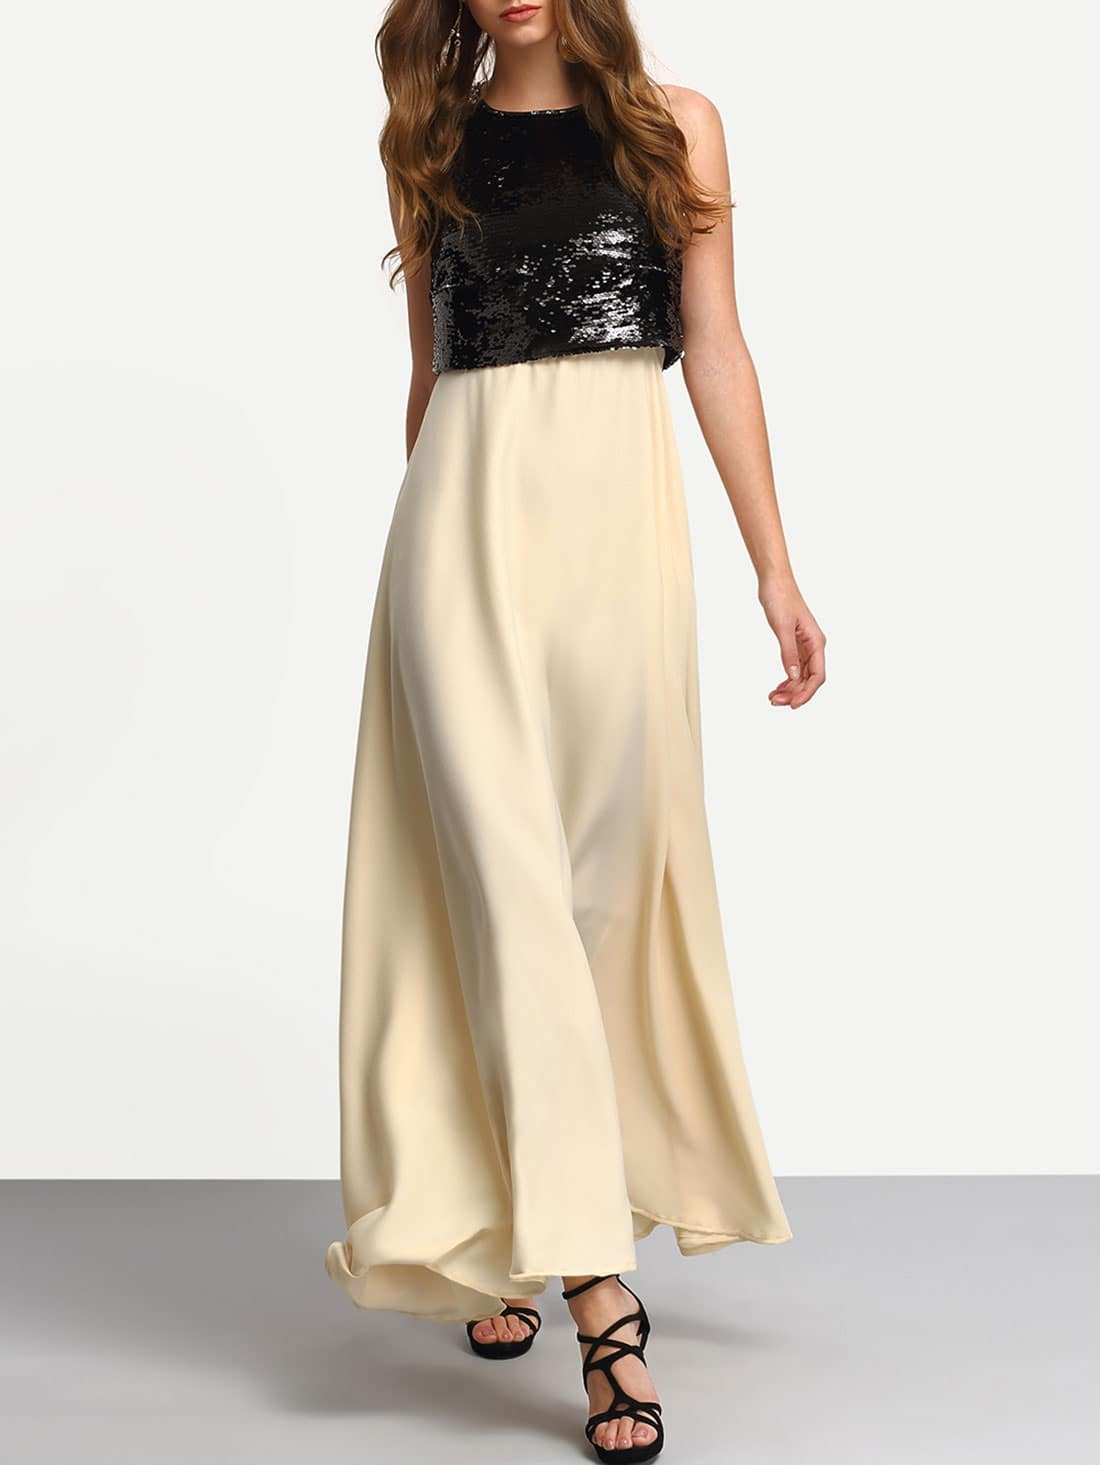 Black Apricot Sequined Splicing Flare Maxi Dress -SheIn(Sheinside)